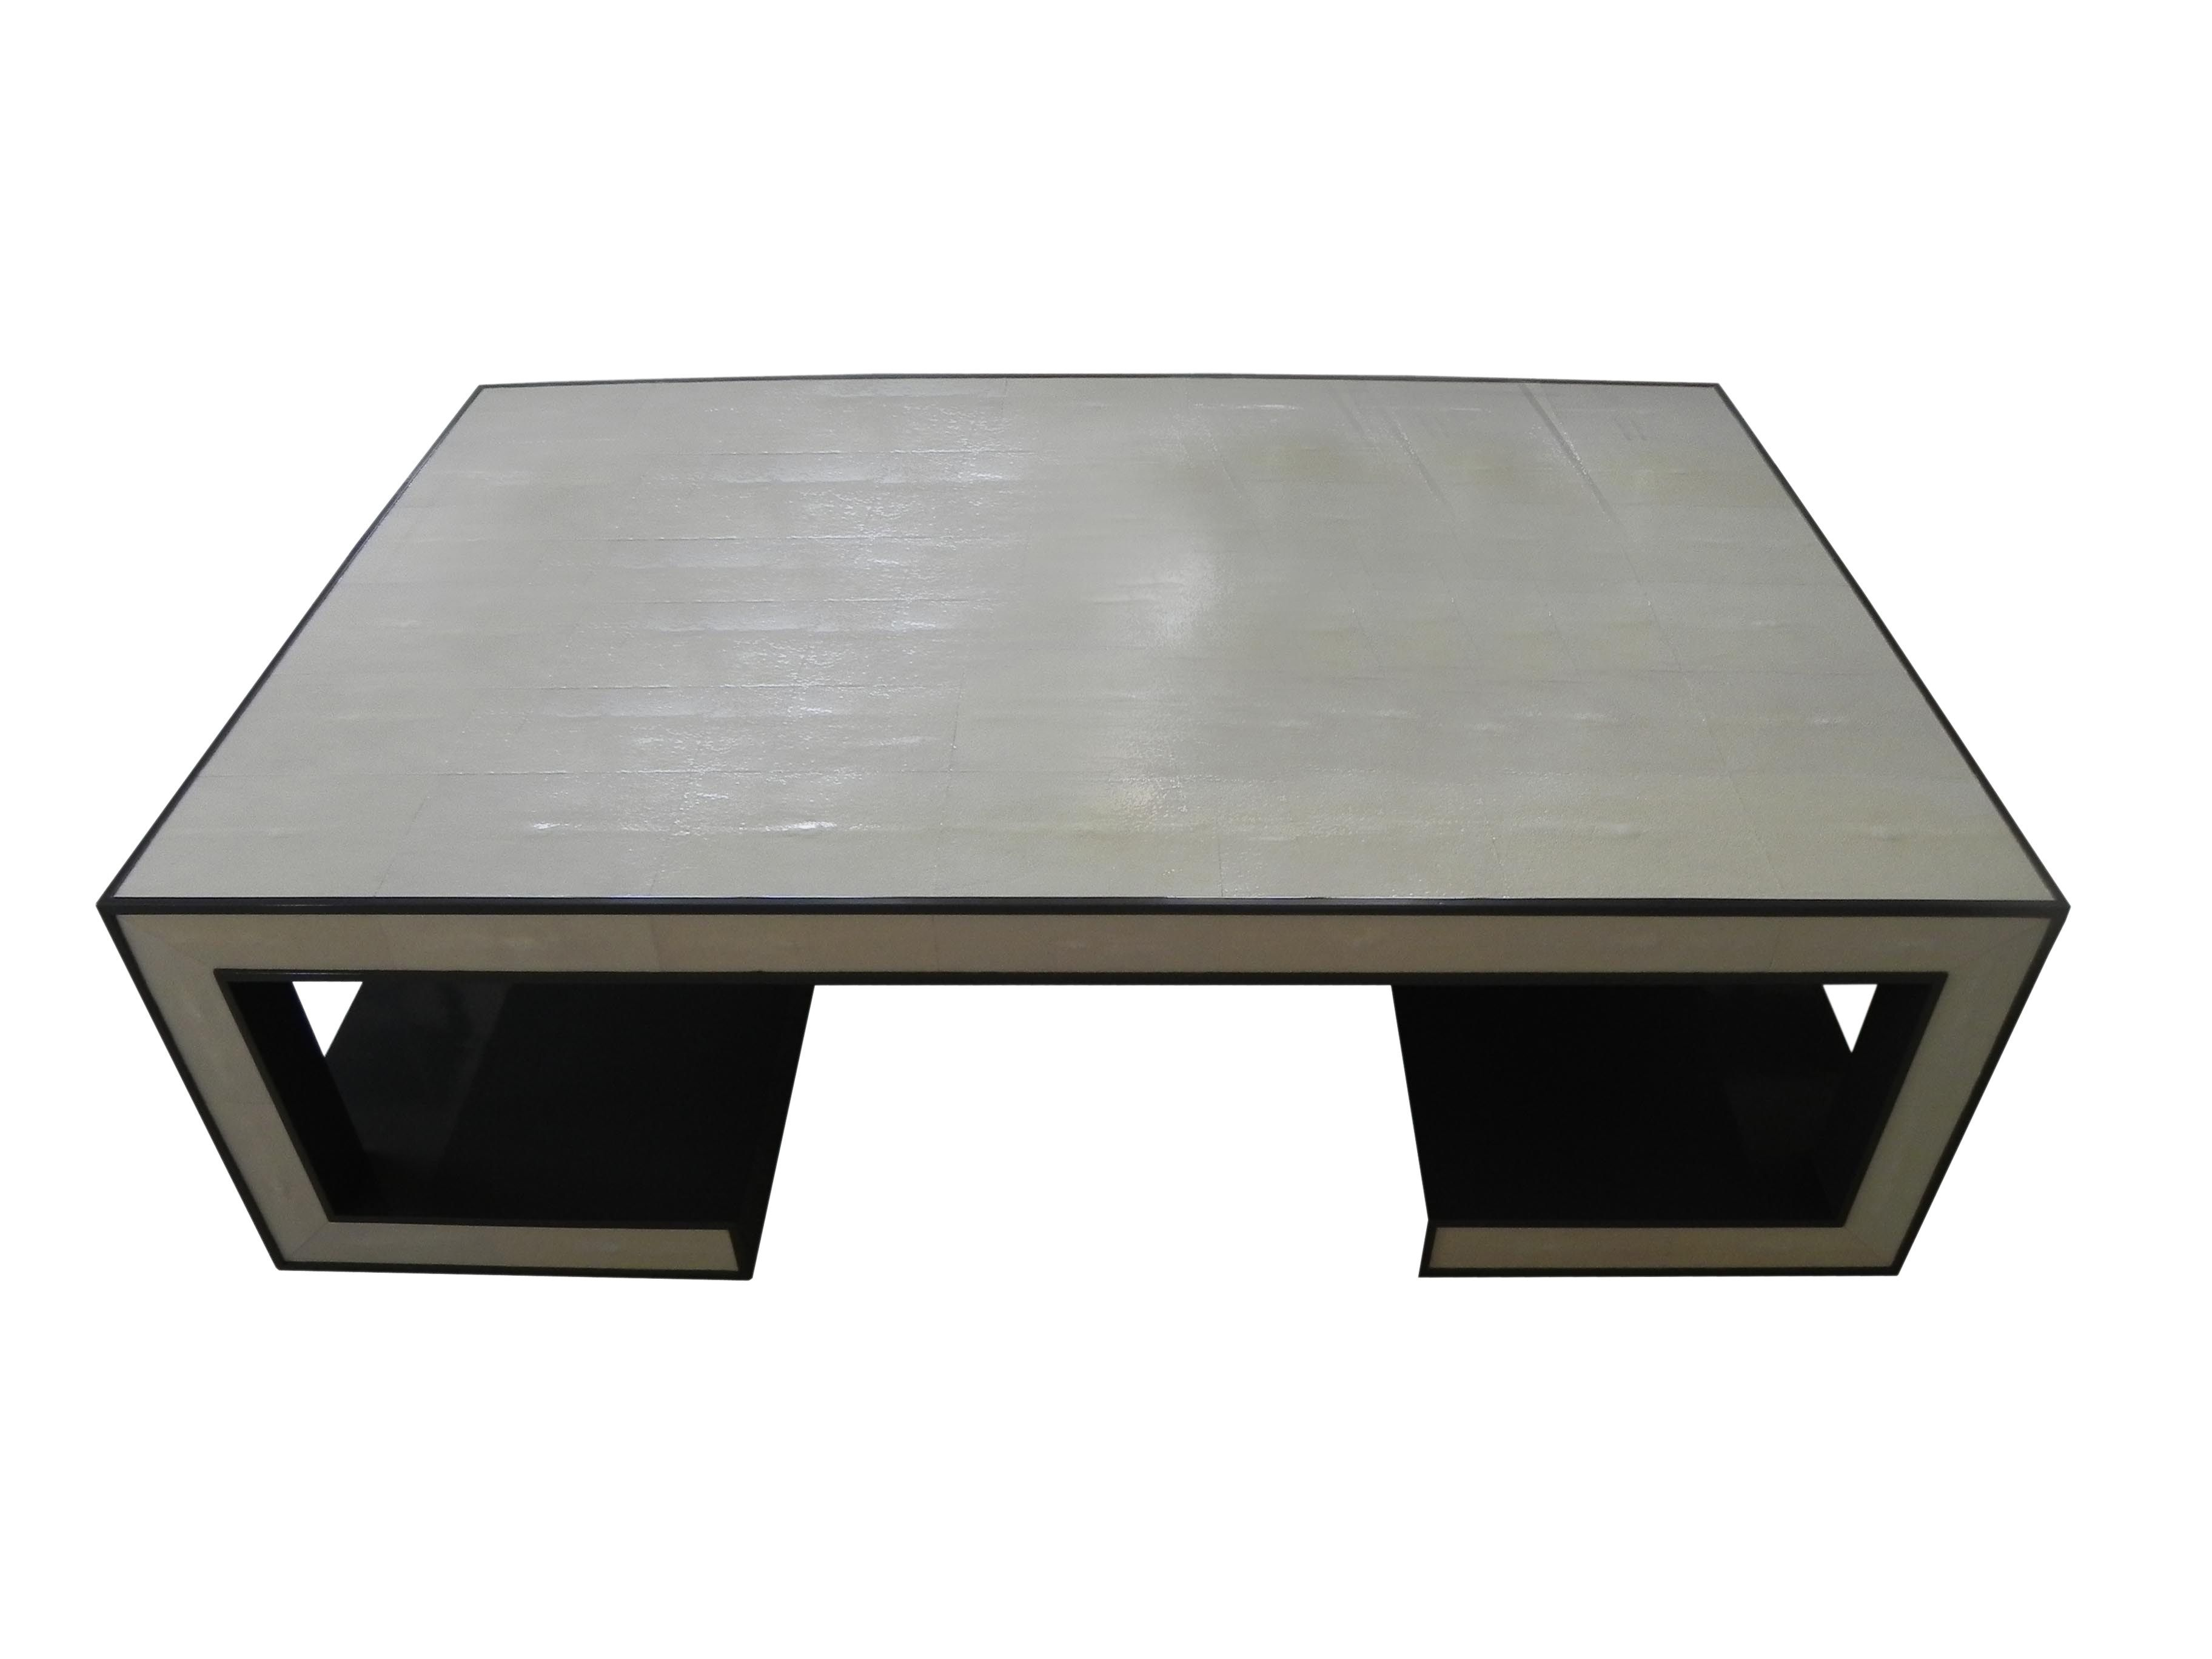 Shagreen Coffee Table Shagreen coffee table, Coffee